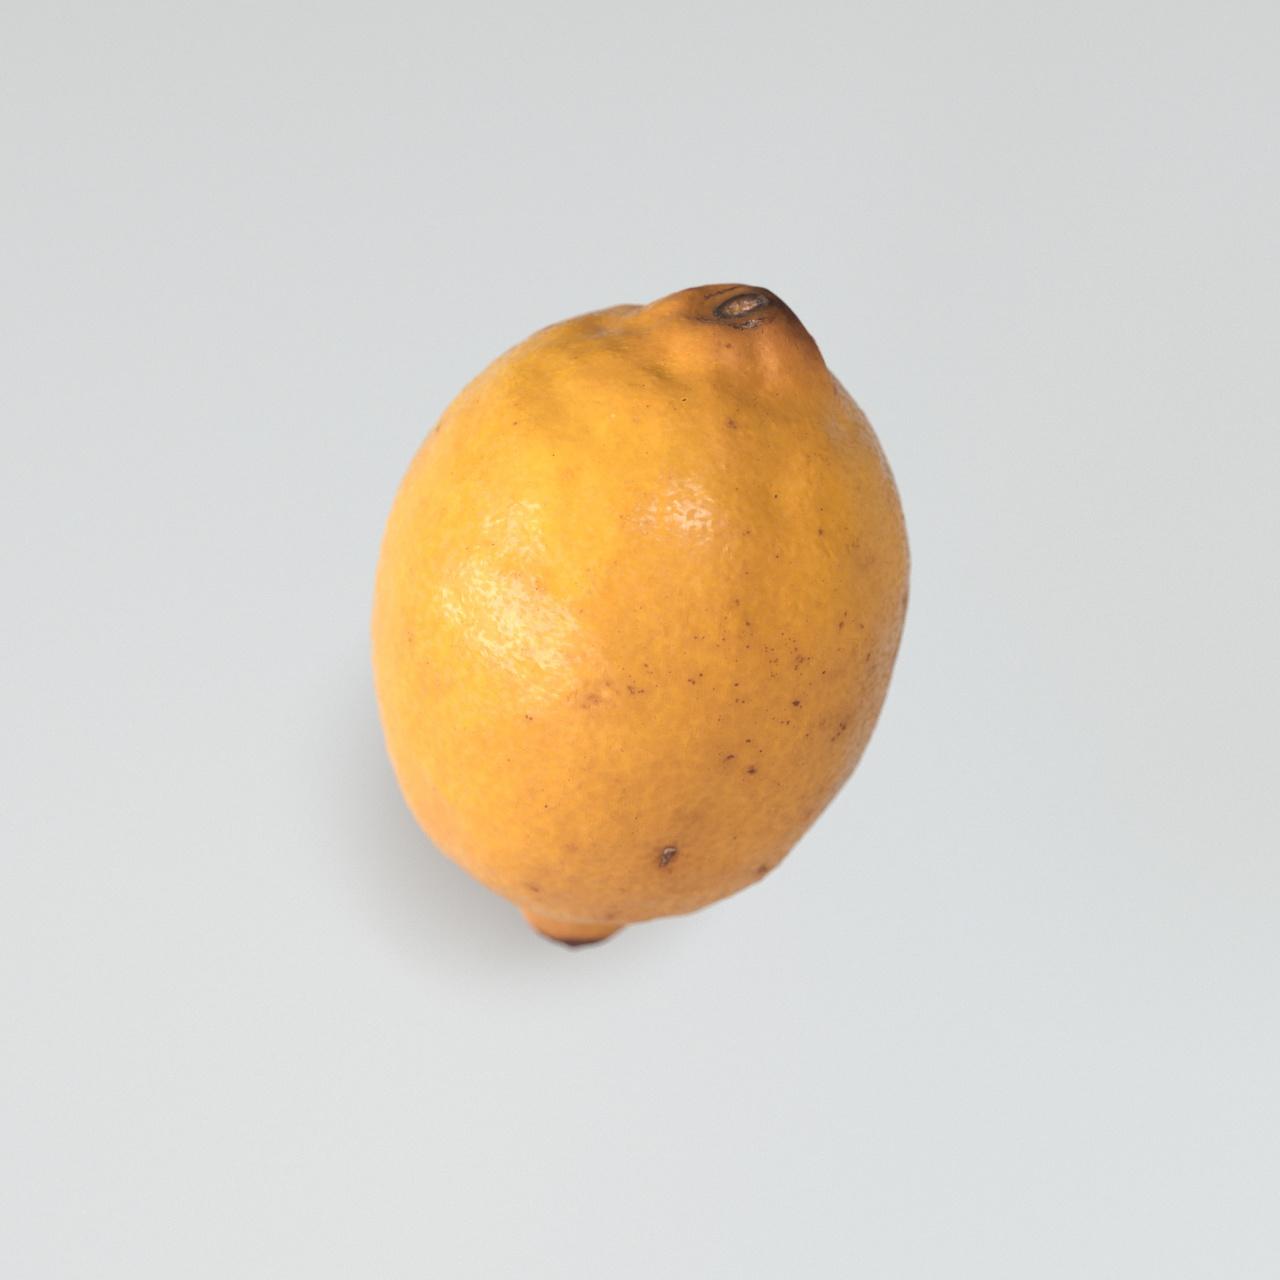 Zitrone Gelb 3D Rendering Eder Stefan Schärding